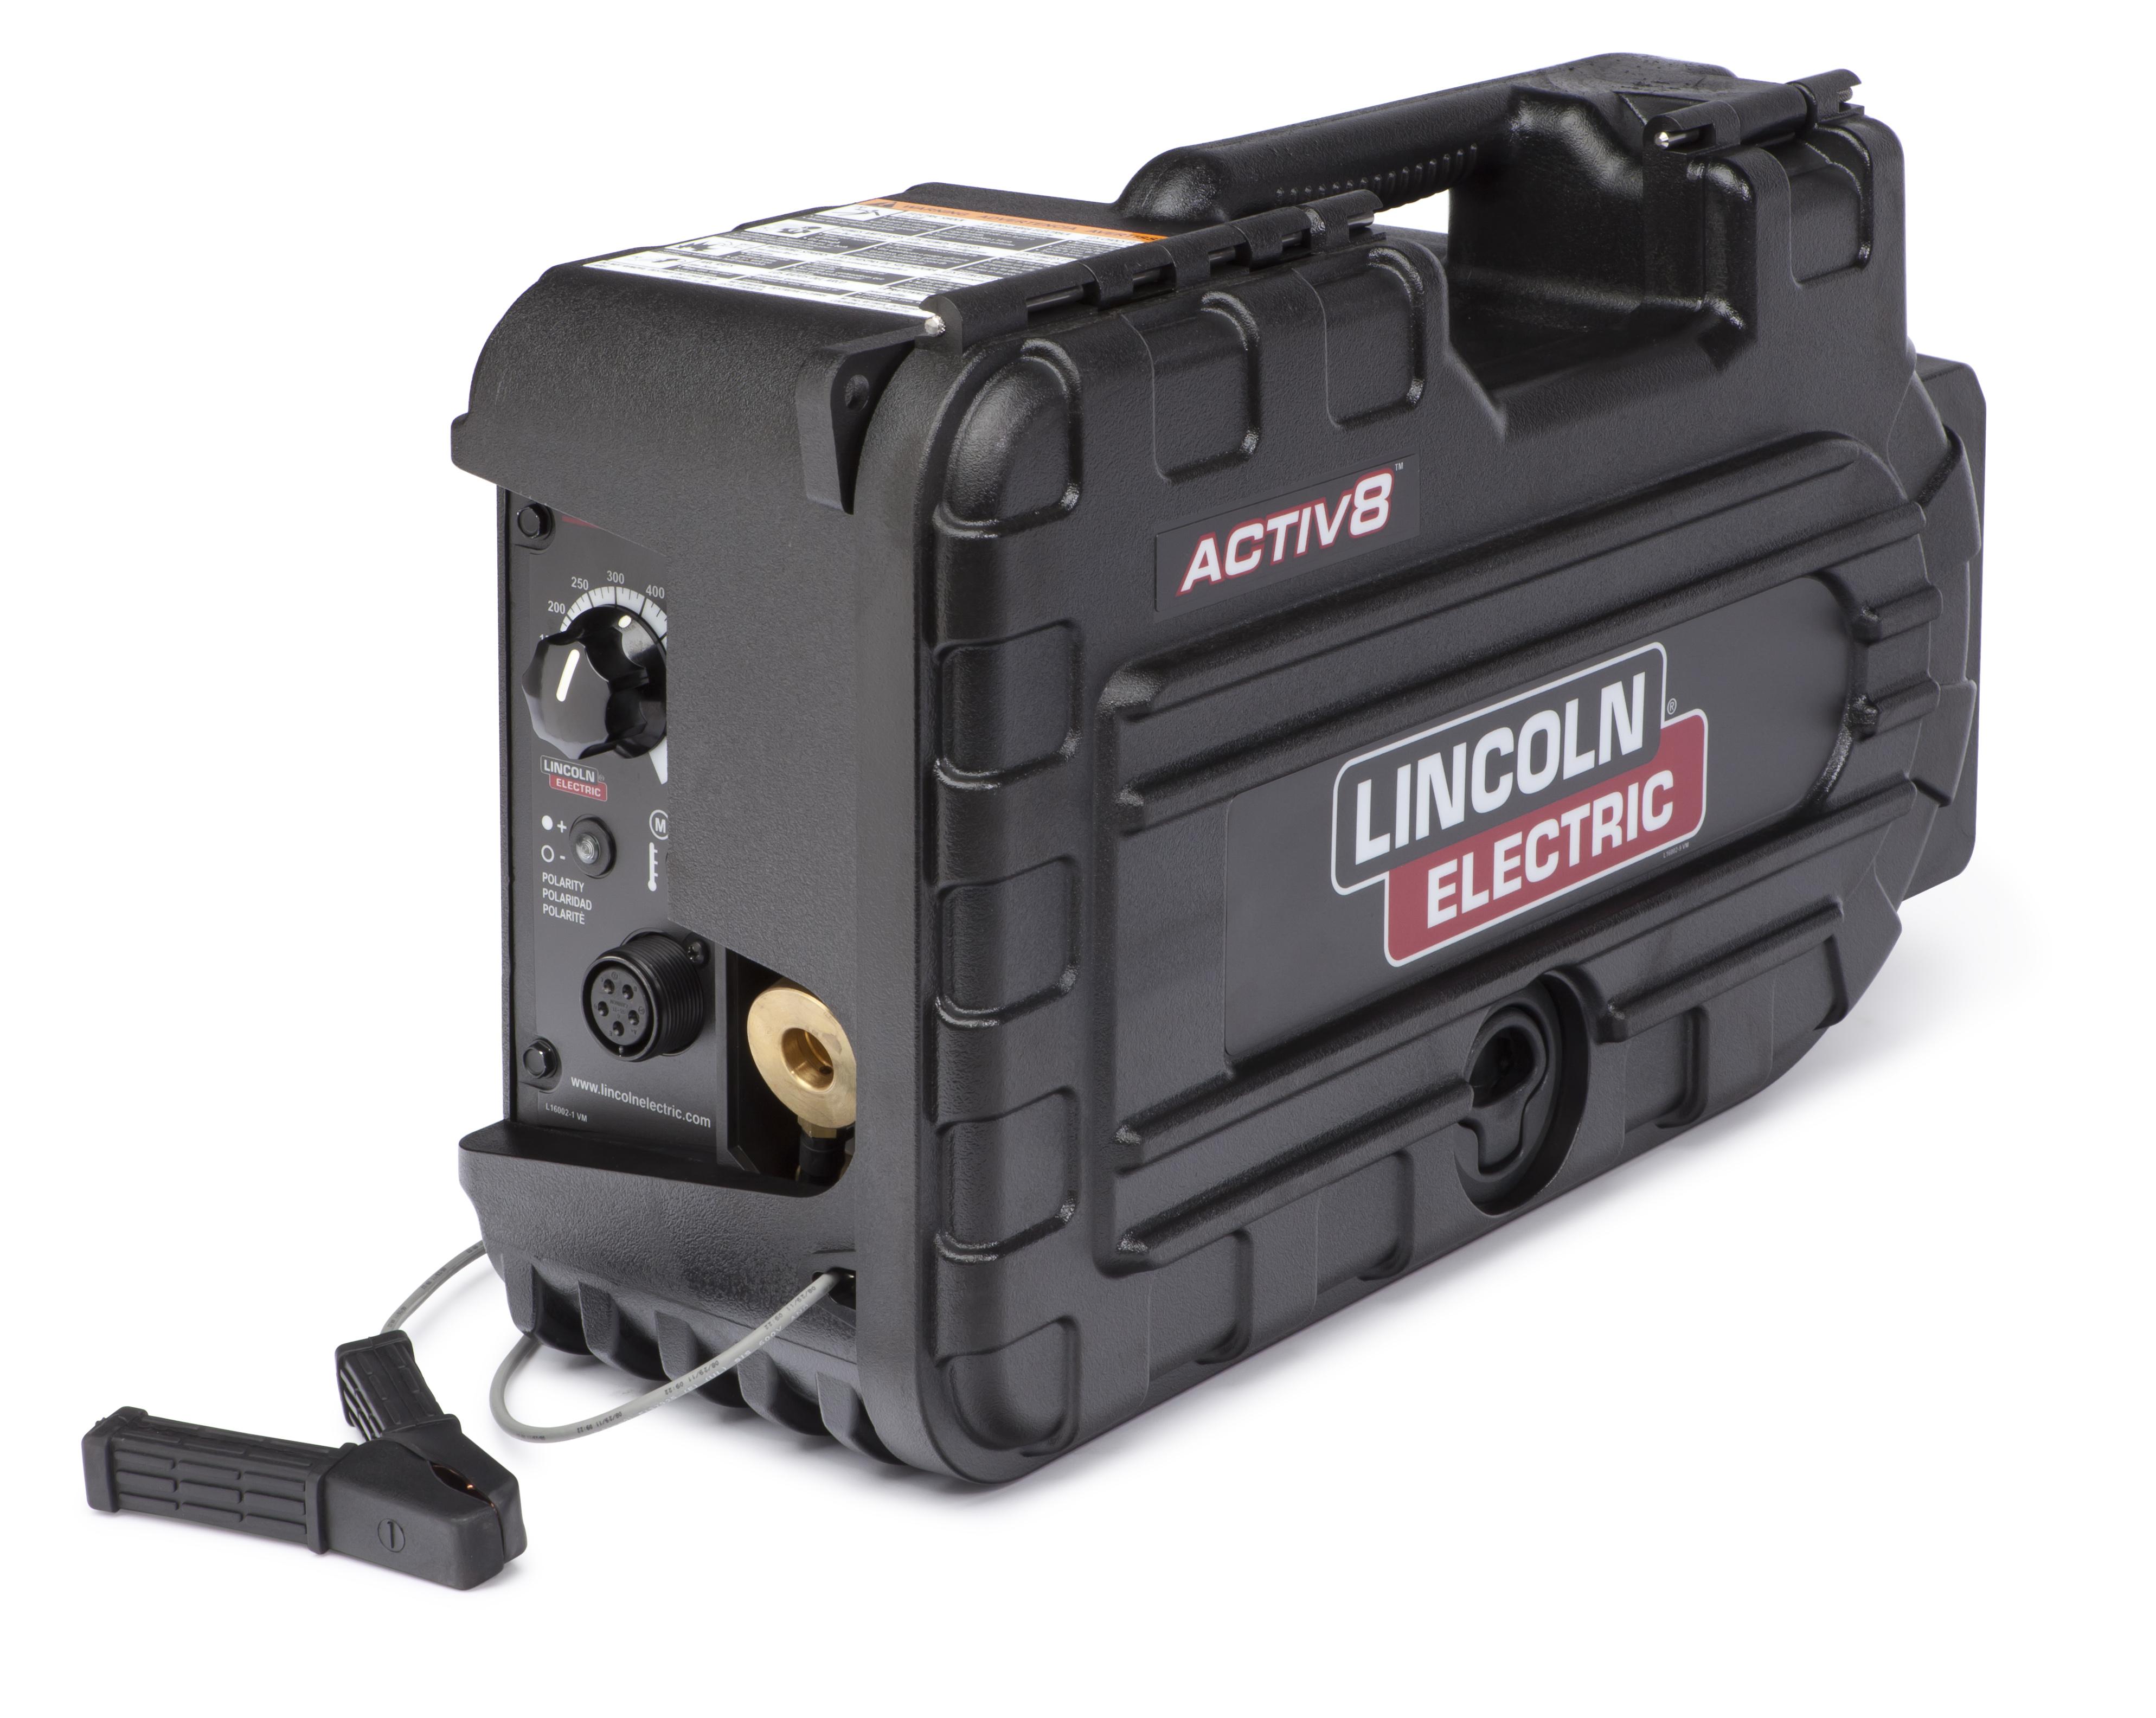 cutter bulldog best plasma engine welder review driven generator lincoln